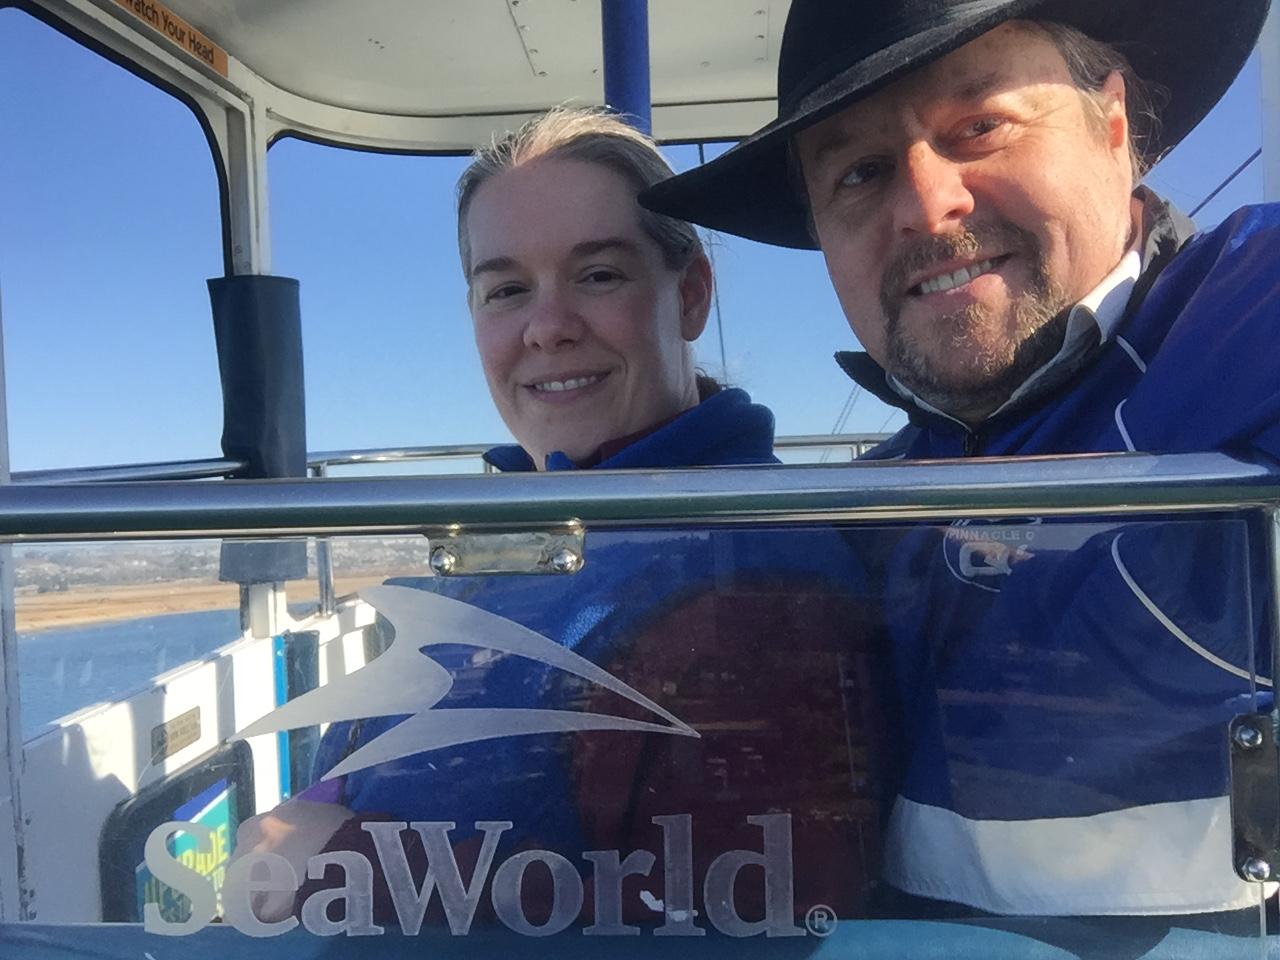 Seaworld, CA 2017